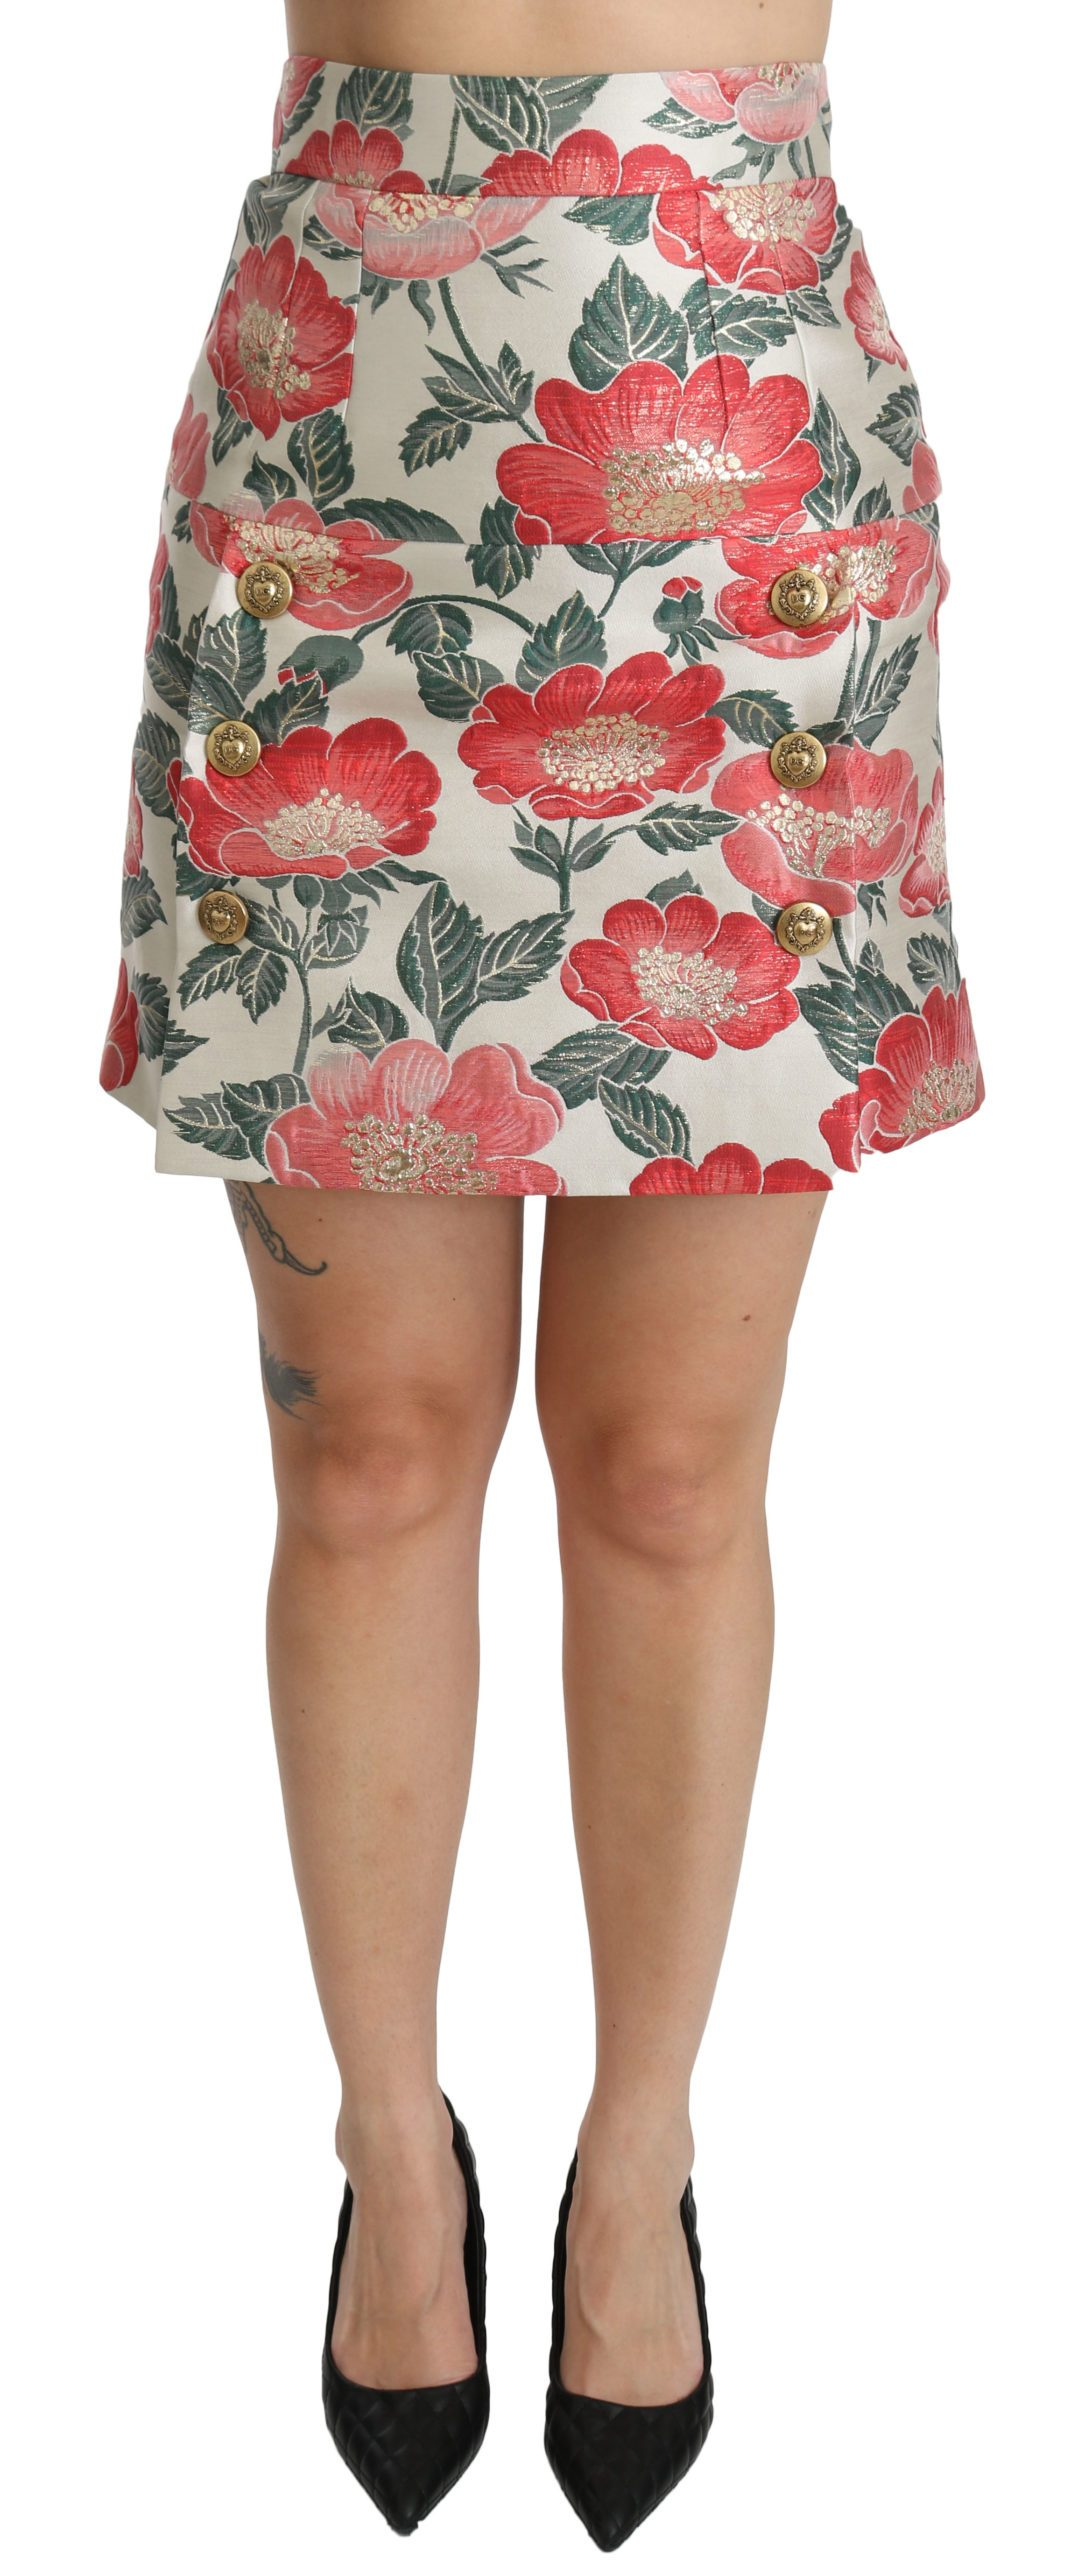 Dolce & Gabbana Women's Floral High Waist Mini Skirt White SKI1064 - IT36   XS